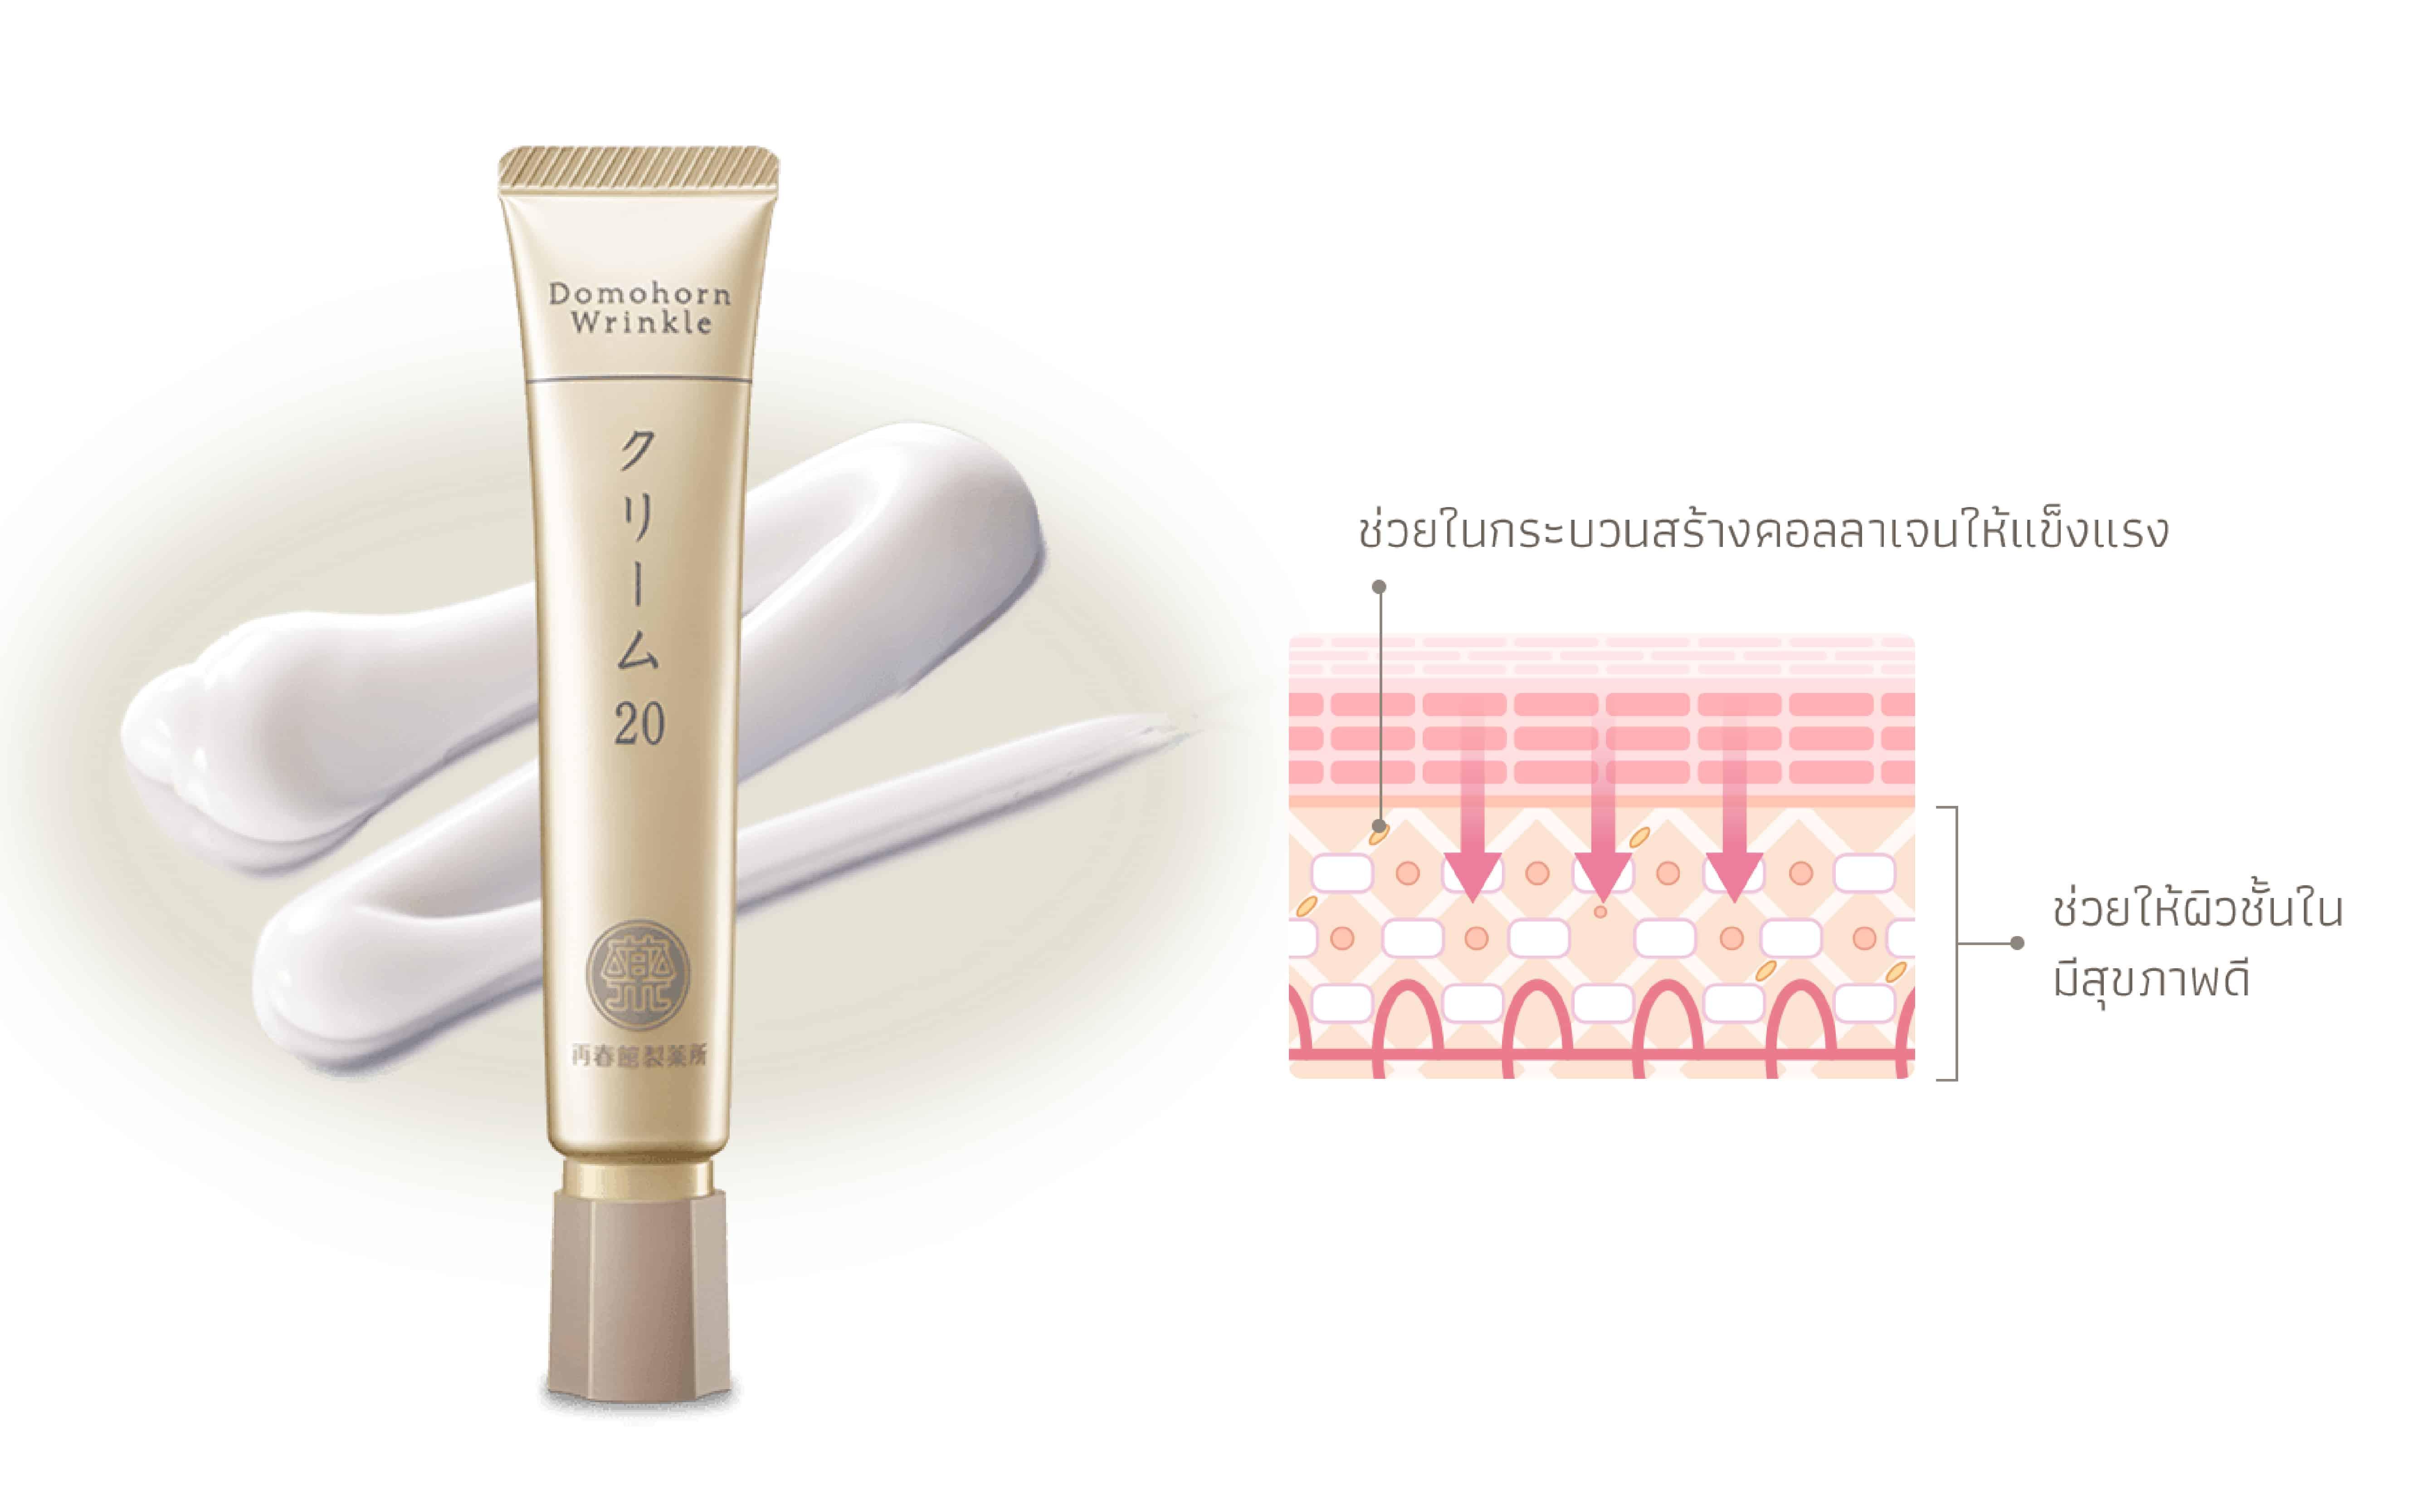 Domohorn Wrinkle | Cream 20 บำรุงล้ำลึก (4,500 บาท)